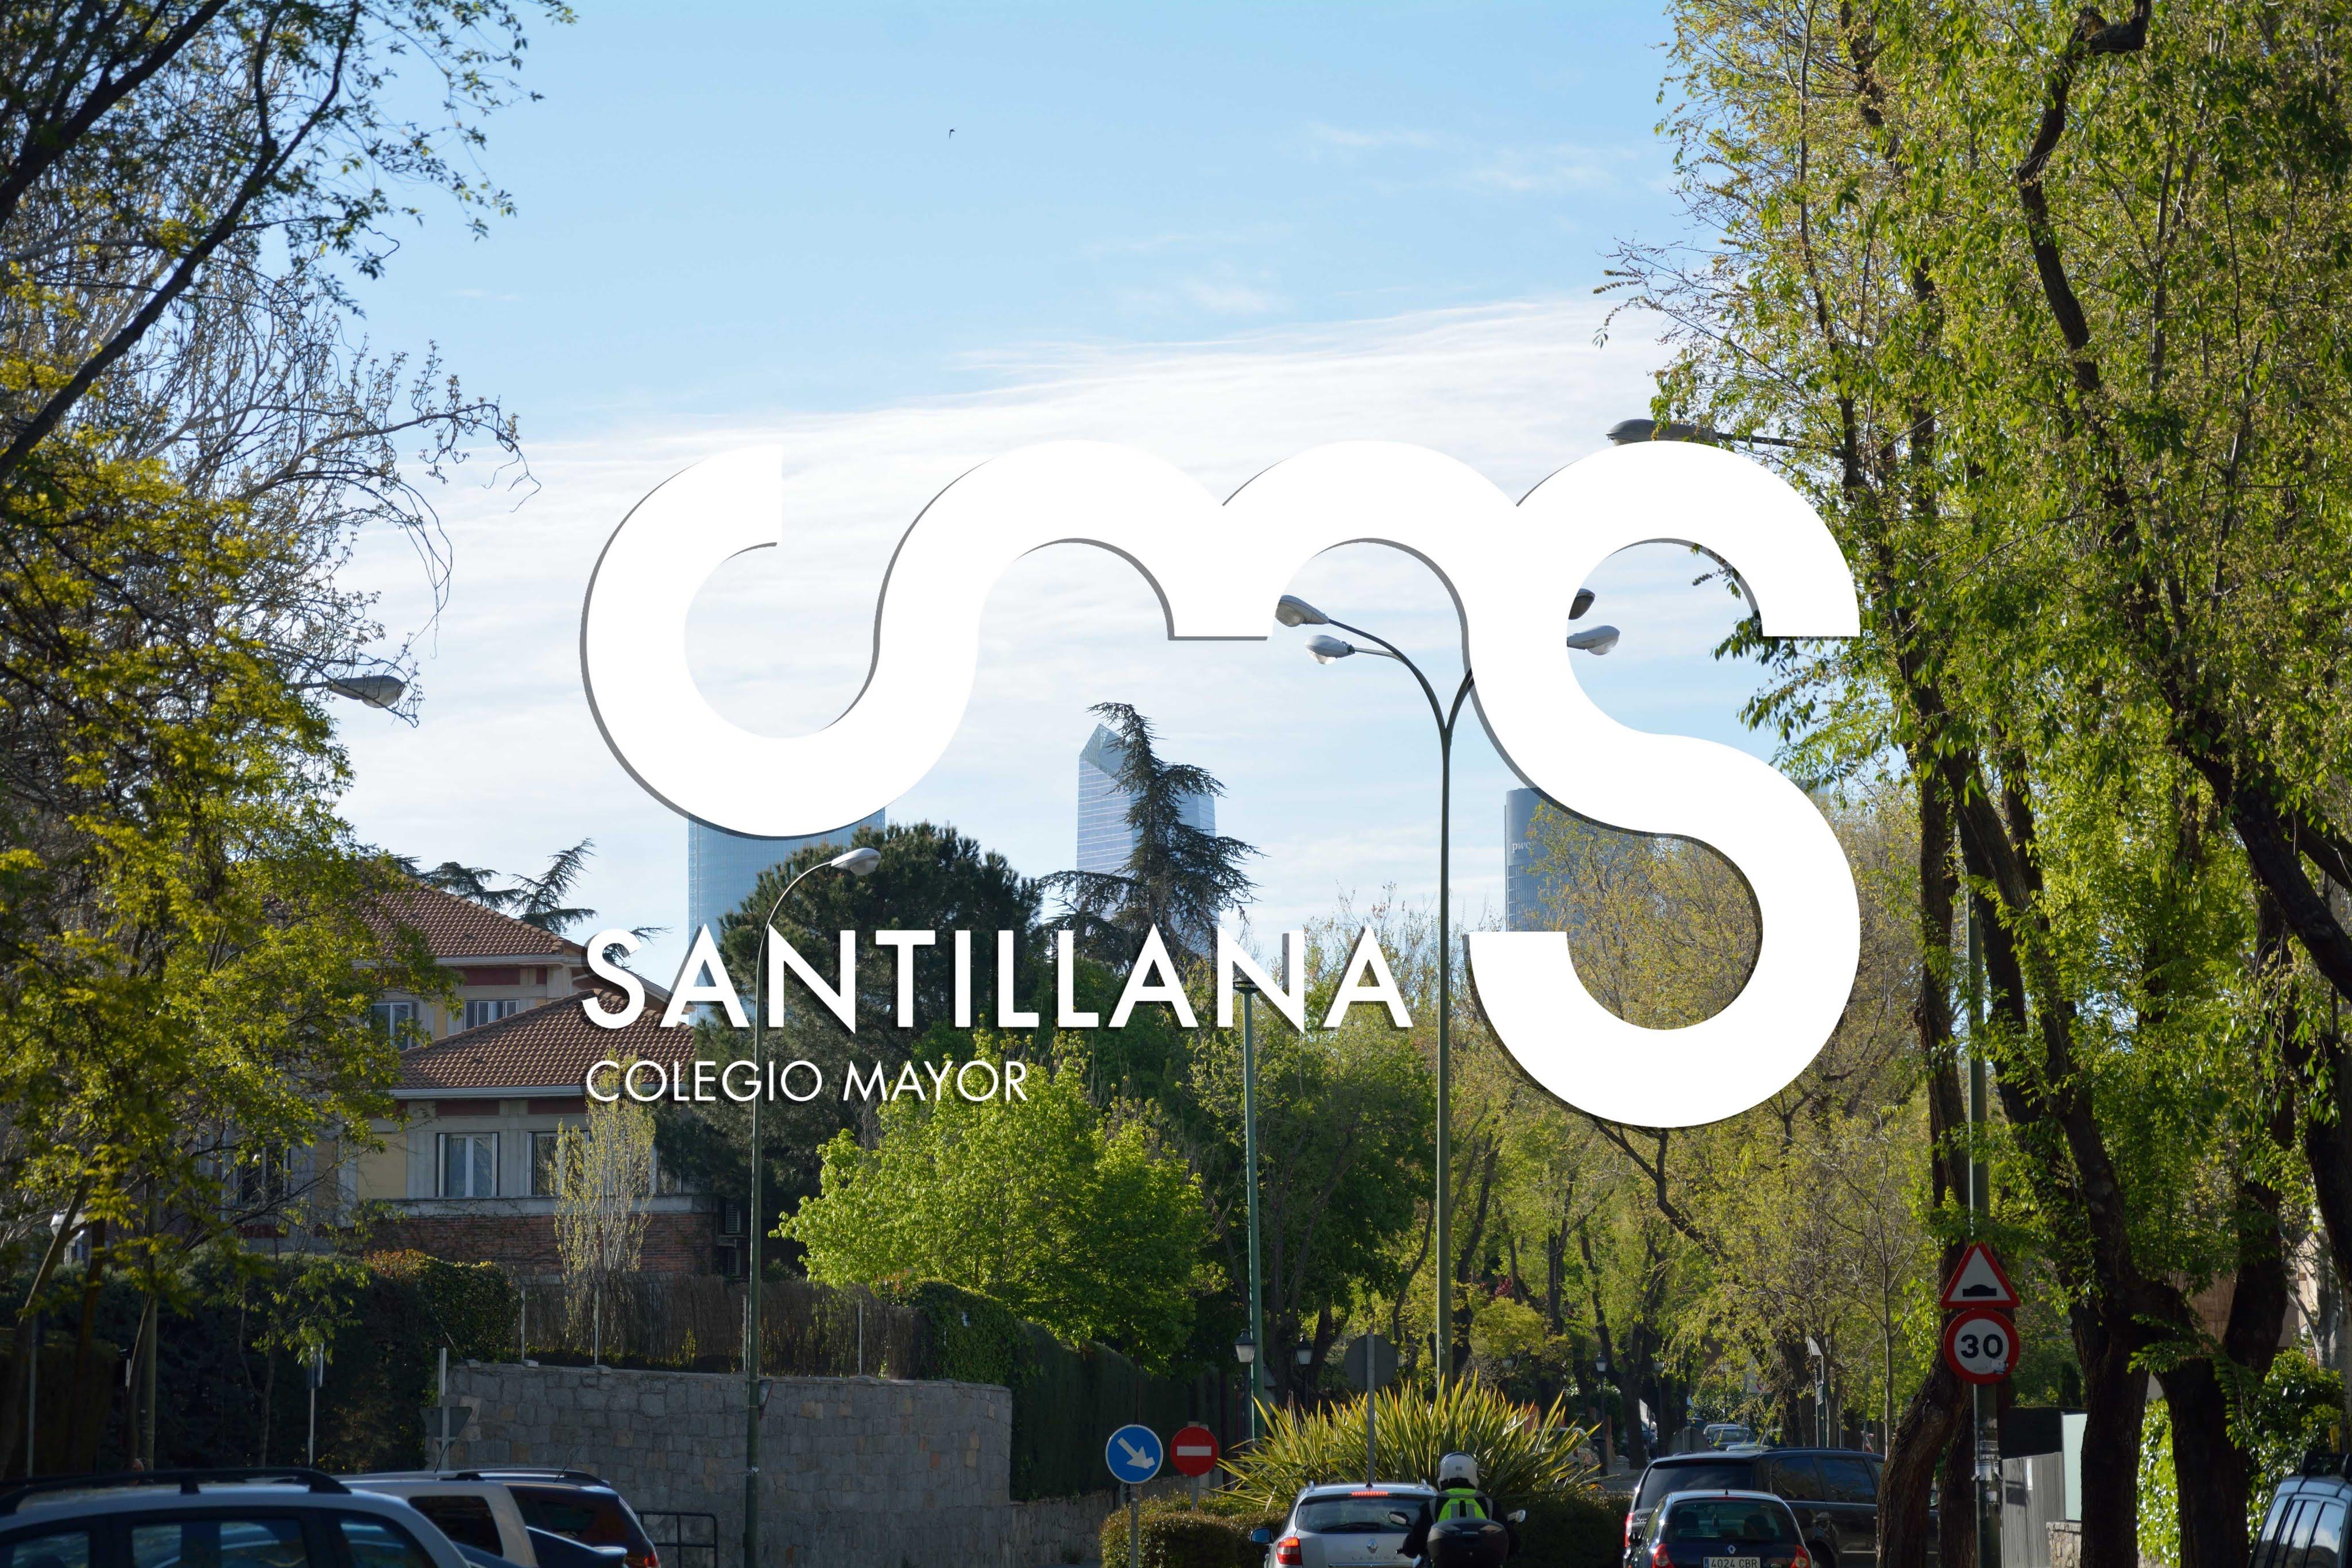 colegio-mayor-santillana-madrid